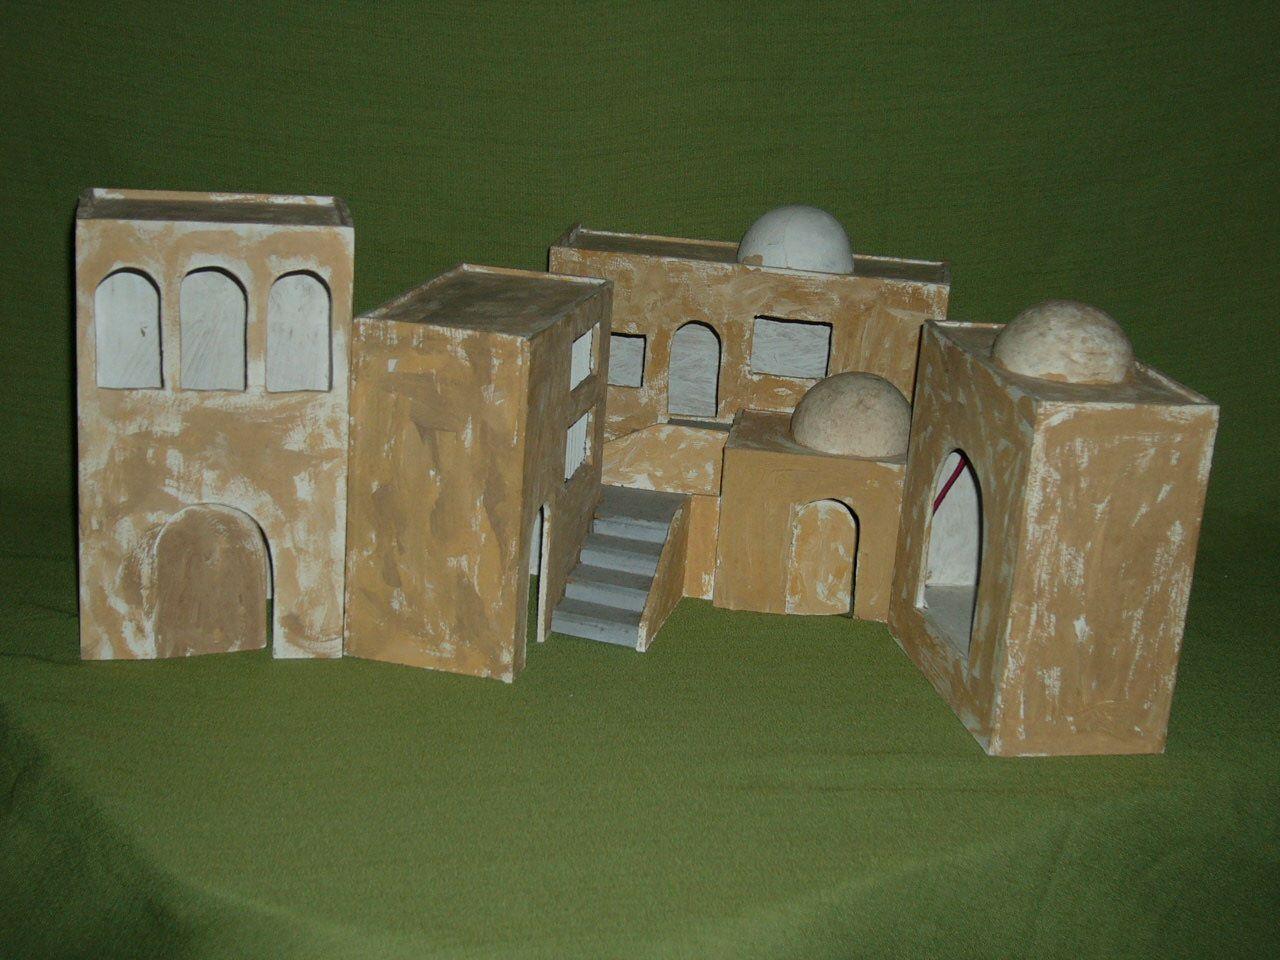 Manualidades Y Navidad Casas Tipo Hebreo Para Belenes Belenes Casas Para Belenes Decoracion Navidad Manualidades